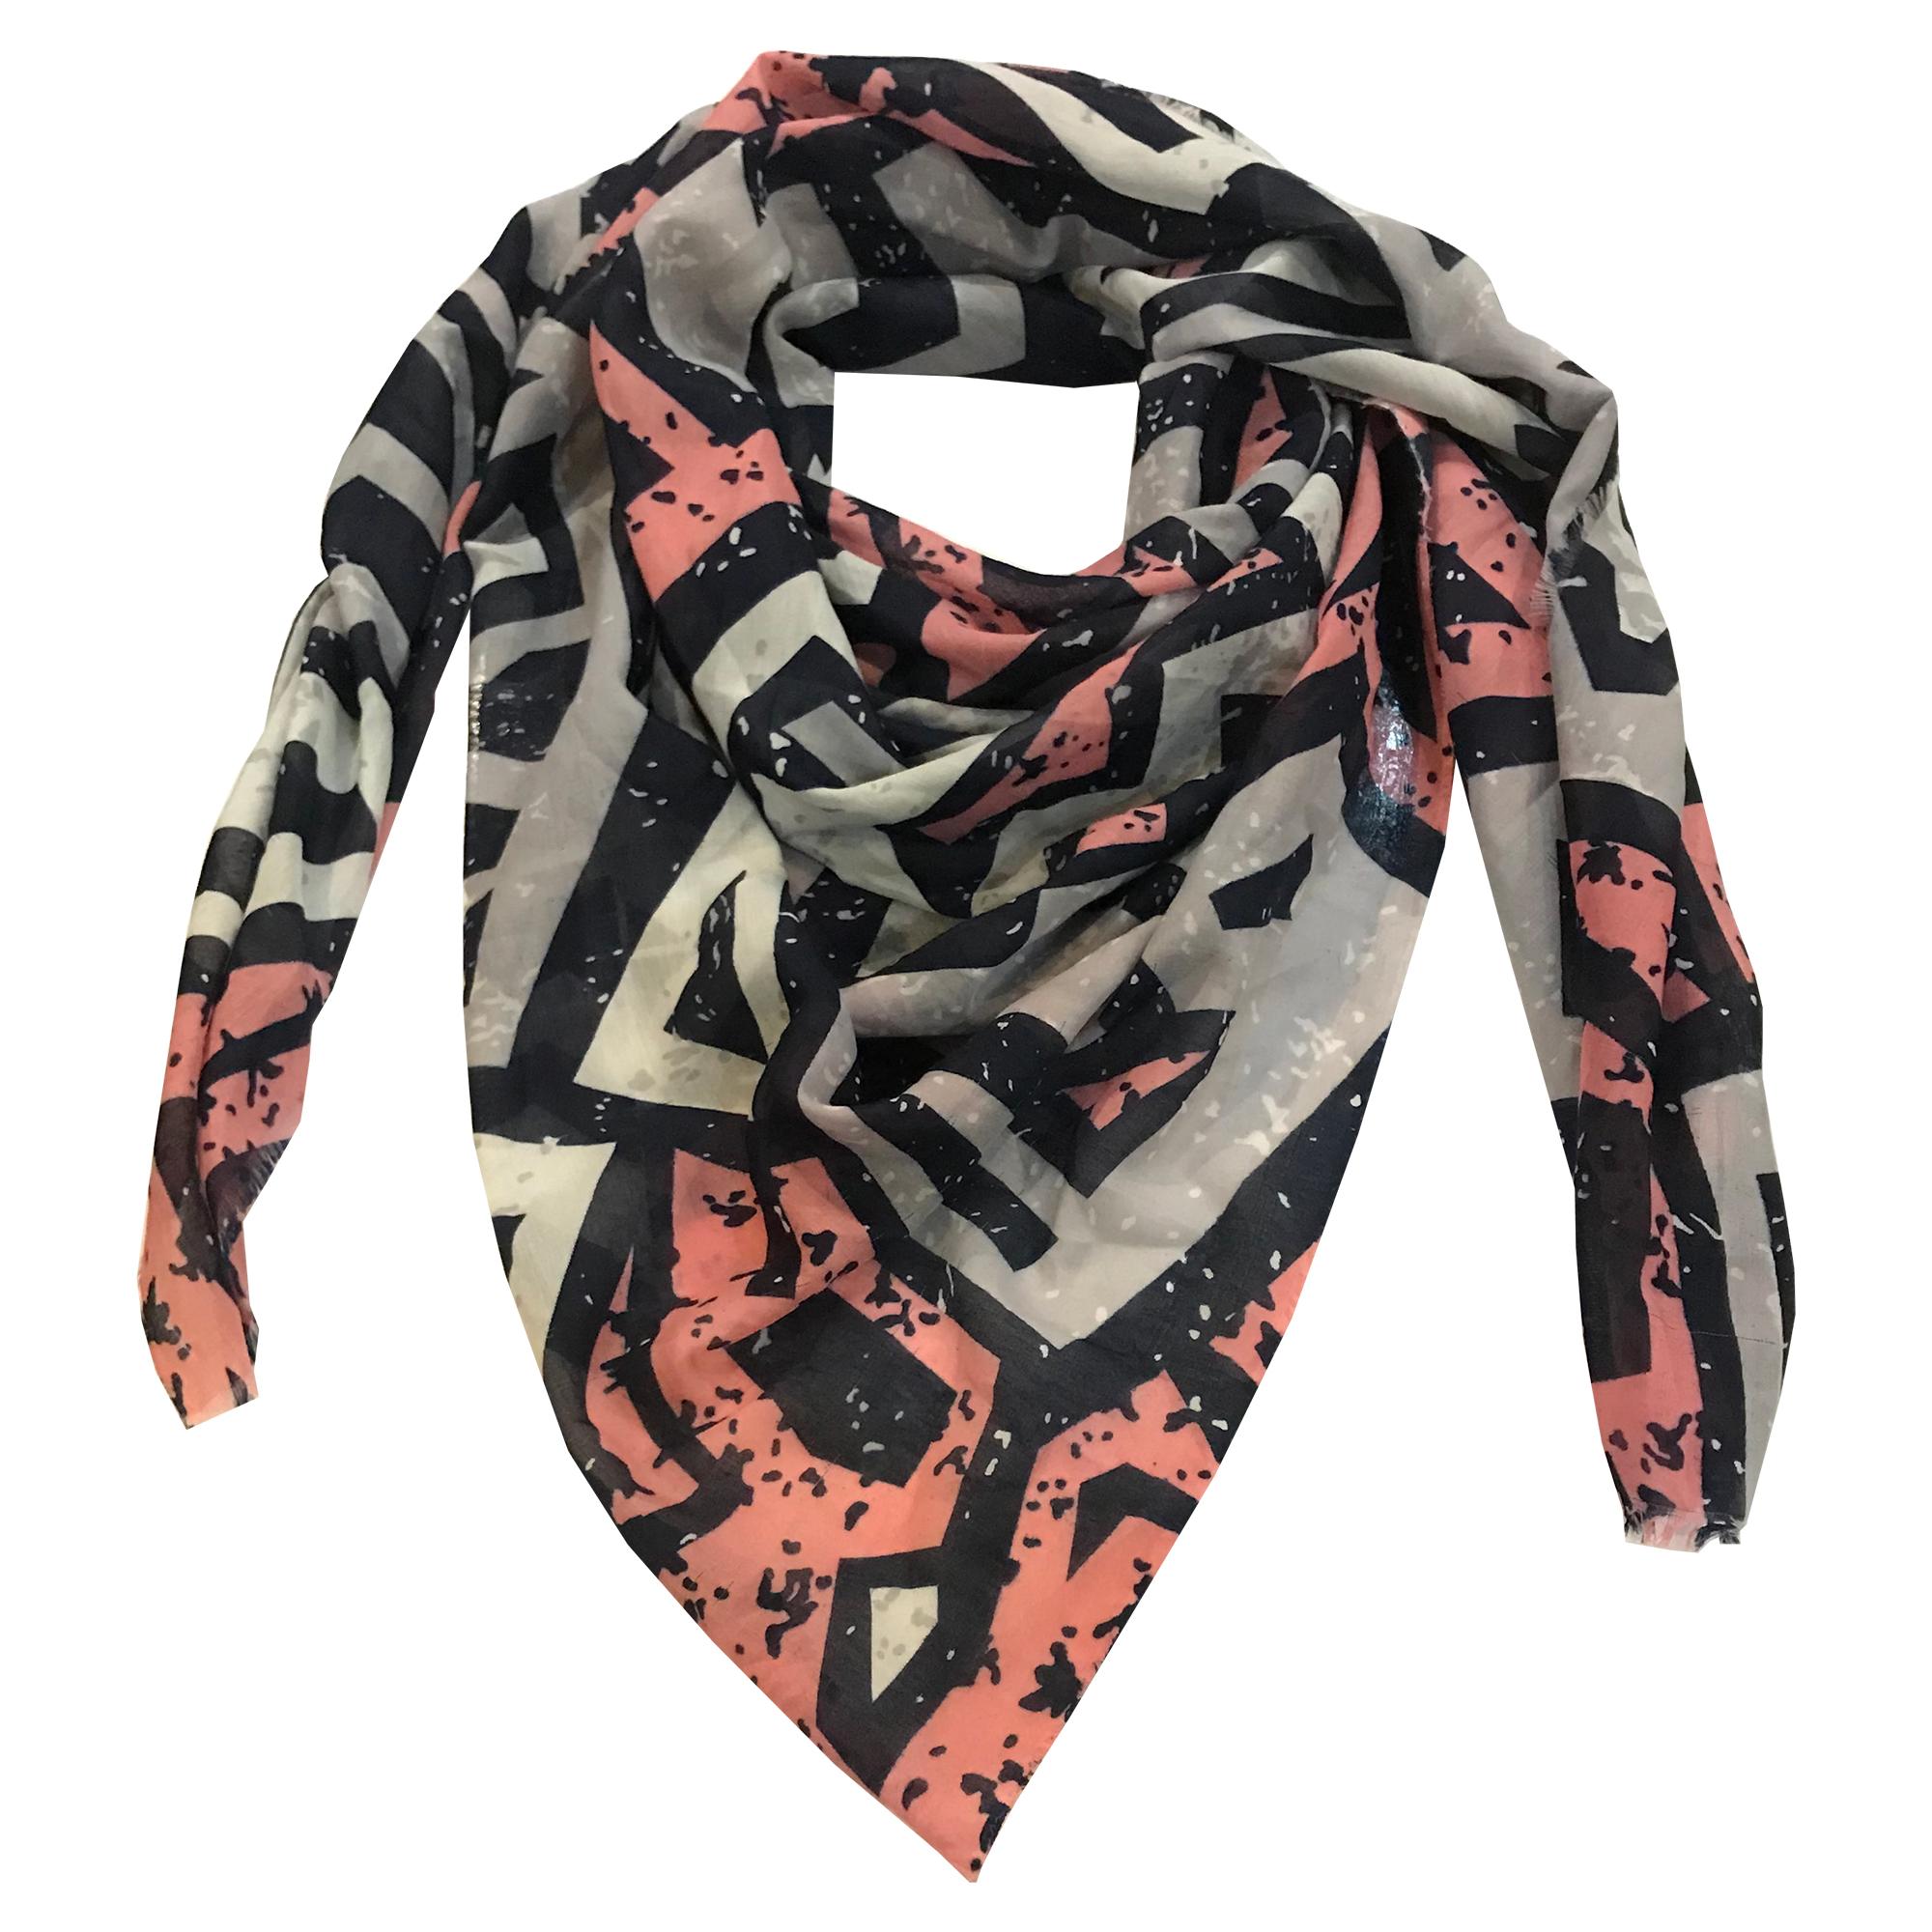 روسری زنانه کد 7007